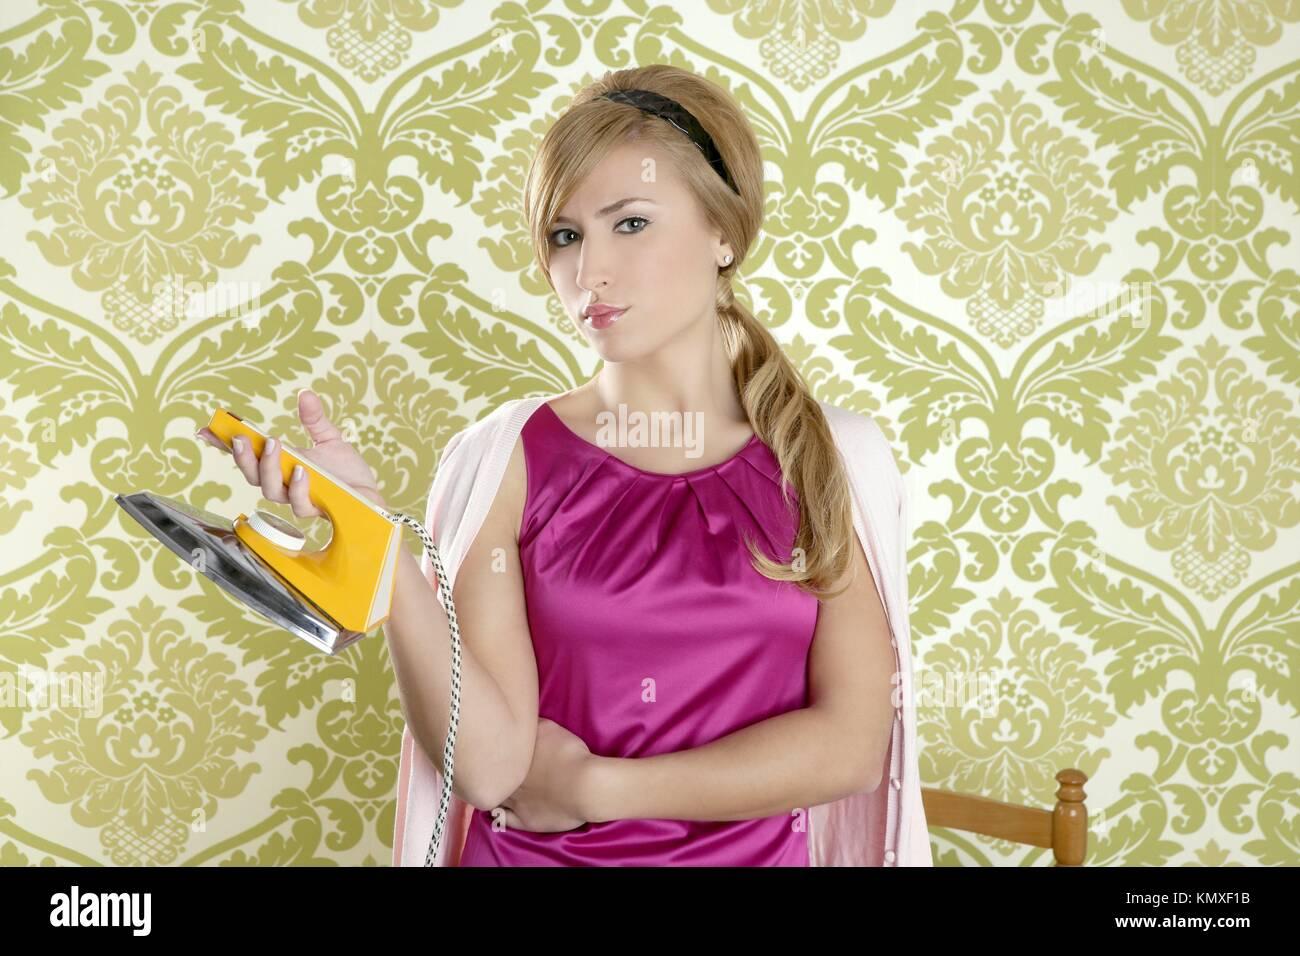 Ferro da stiro vintage retrò donna casalinga umorismo sfondo Immagini Stock ef3262ed20a3